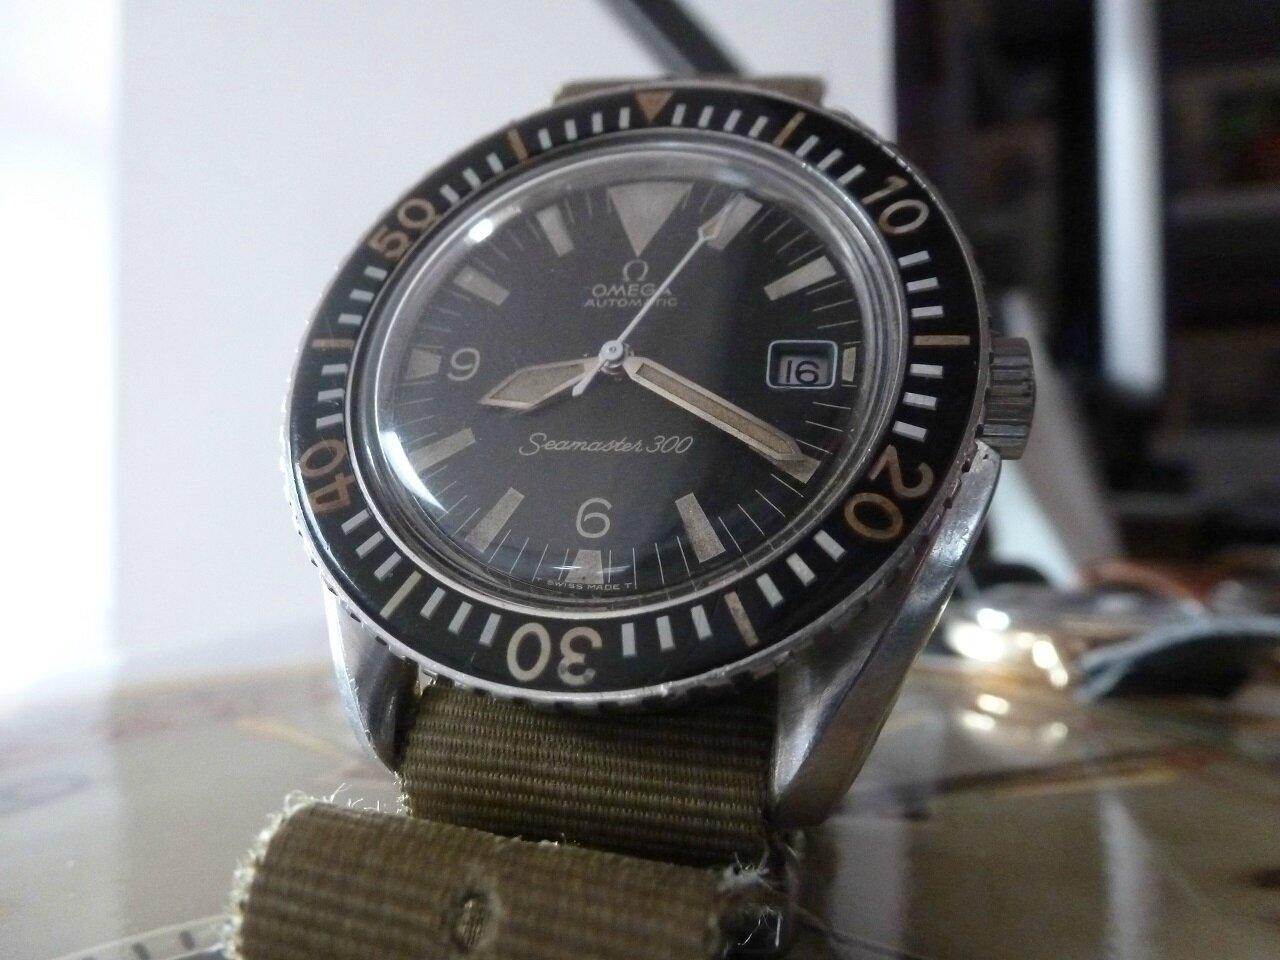 Seamaster 300 166024 BIG TRIANGLE 1967 d'origine !!!